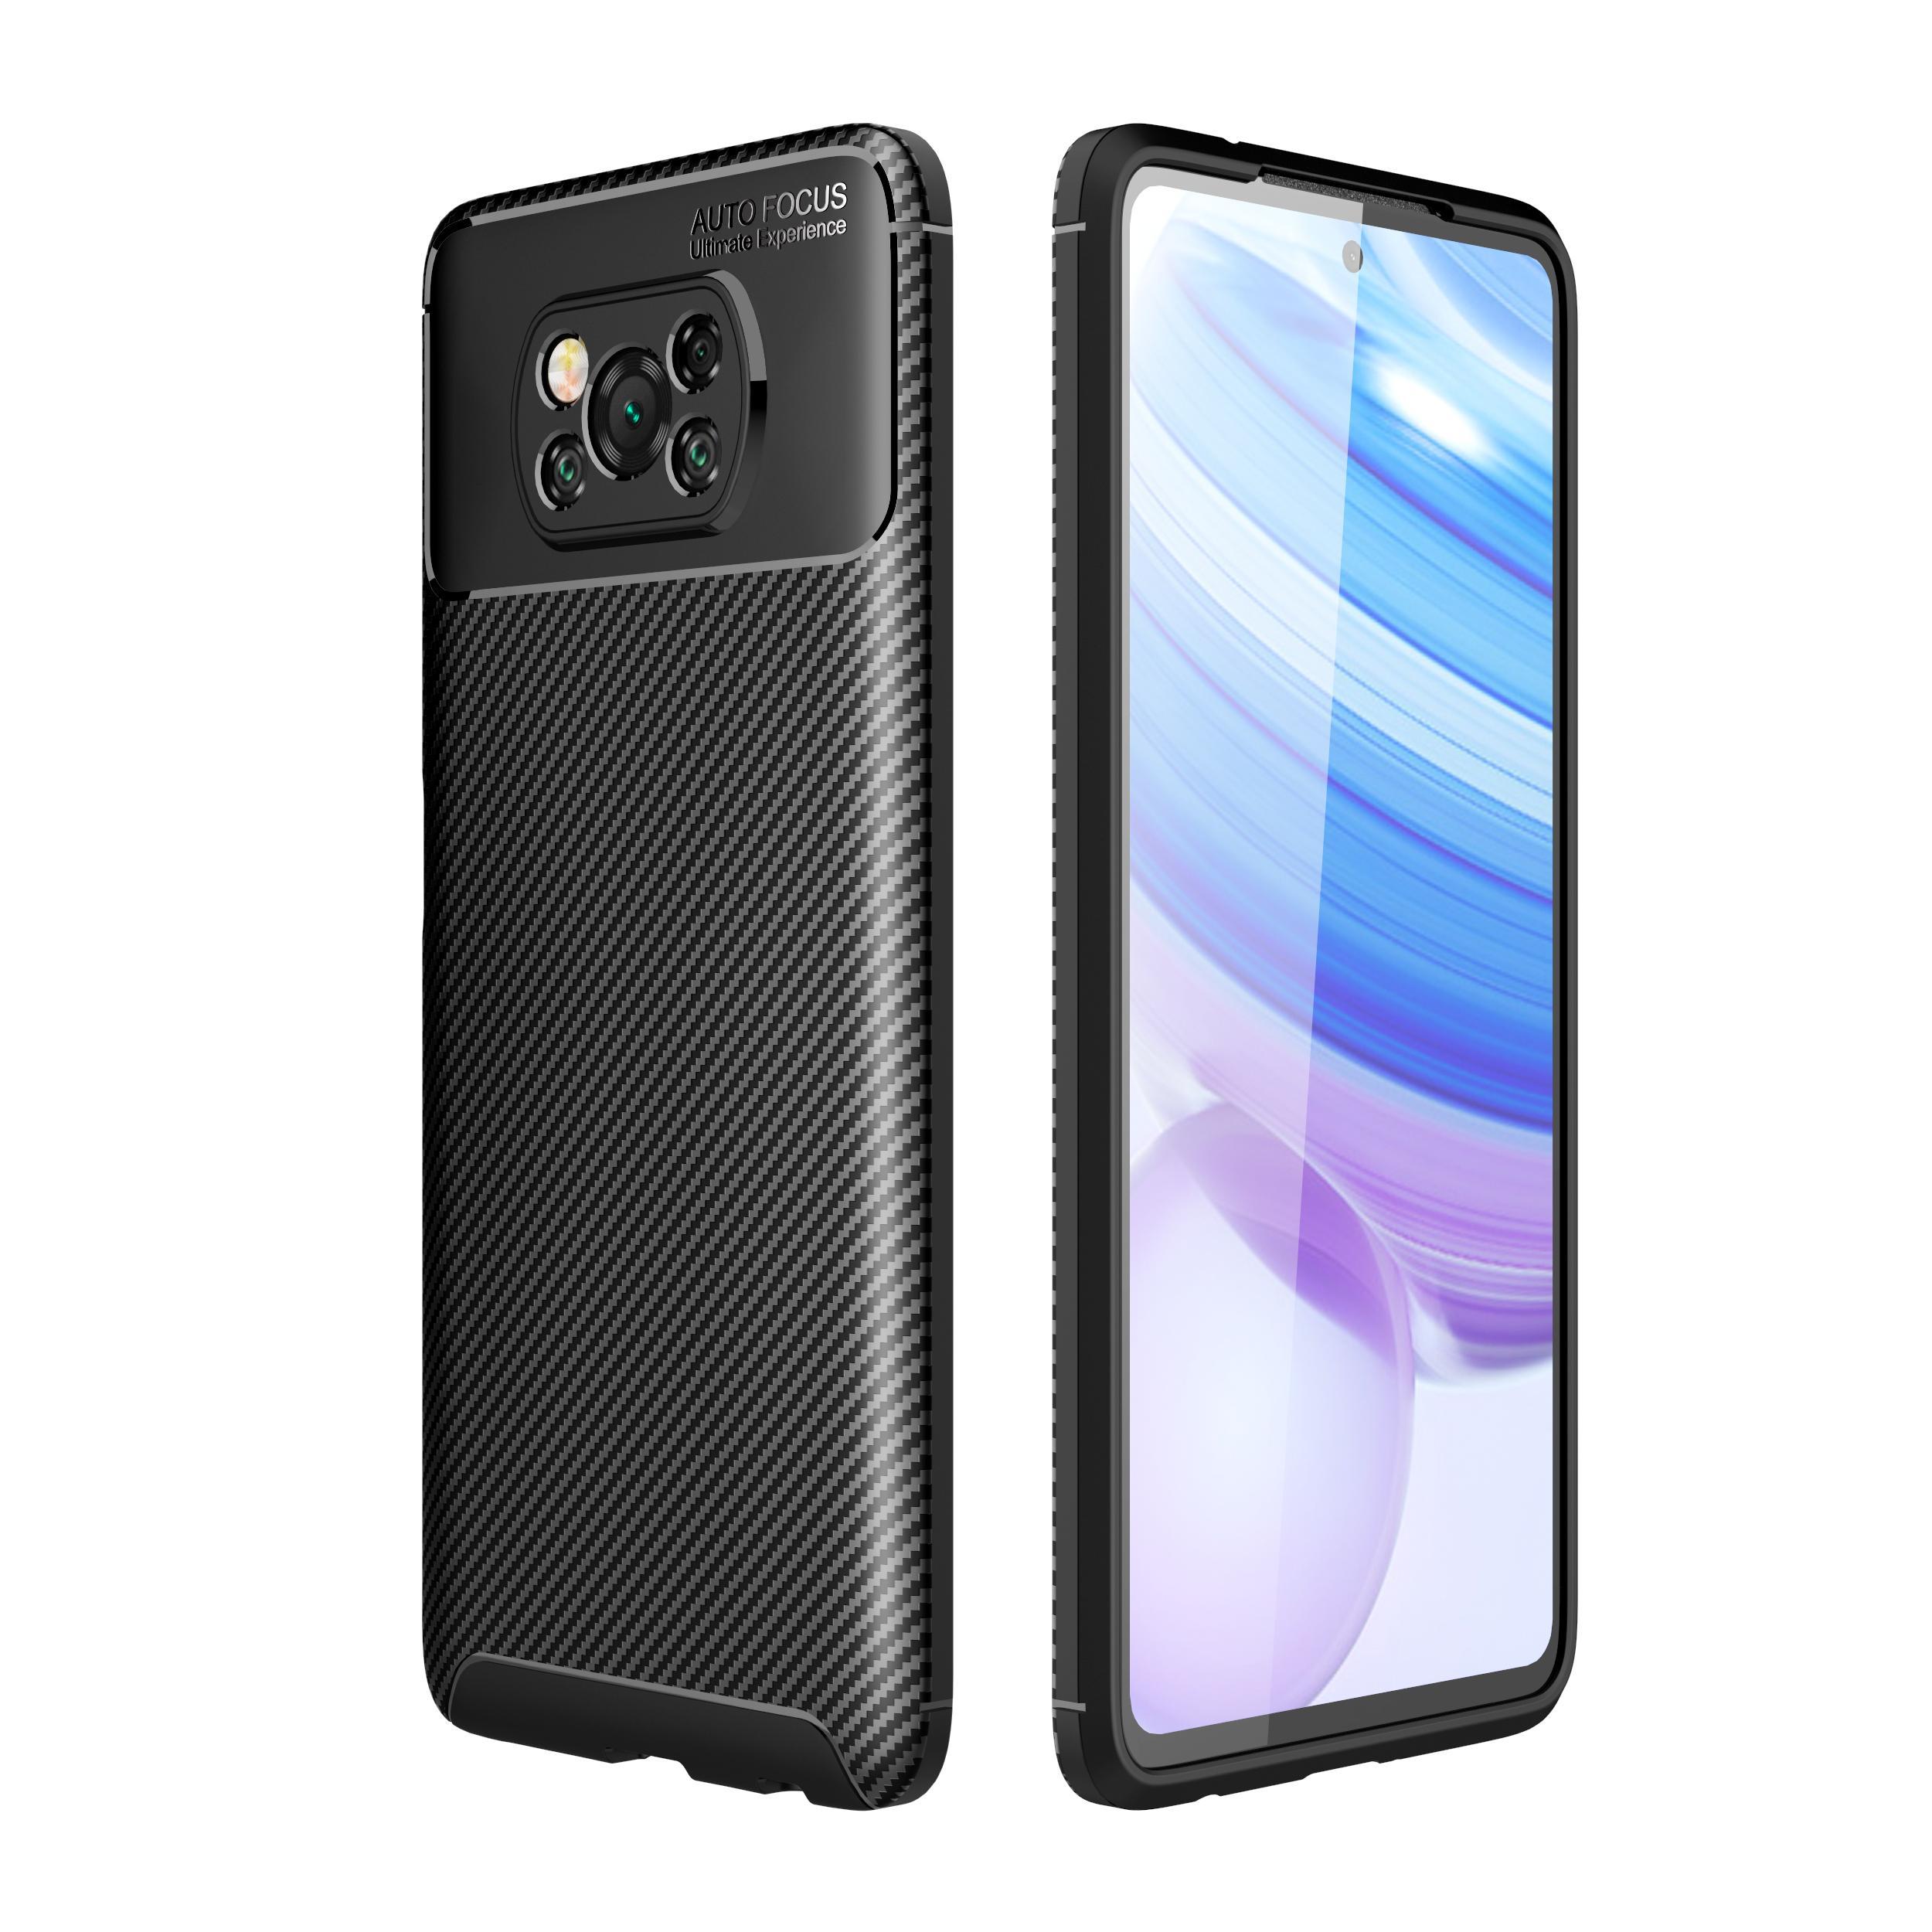 Тонкий углеродного волокна дизайн ТПУ Мягкий чехол для Xiaomi Poco X3 NFC Mi 10 Ультра редми 9А 10X Примечание 9S Примечание 9 Pro